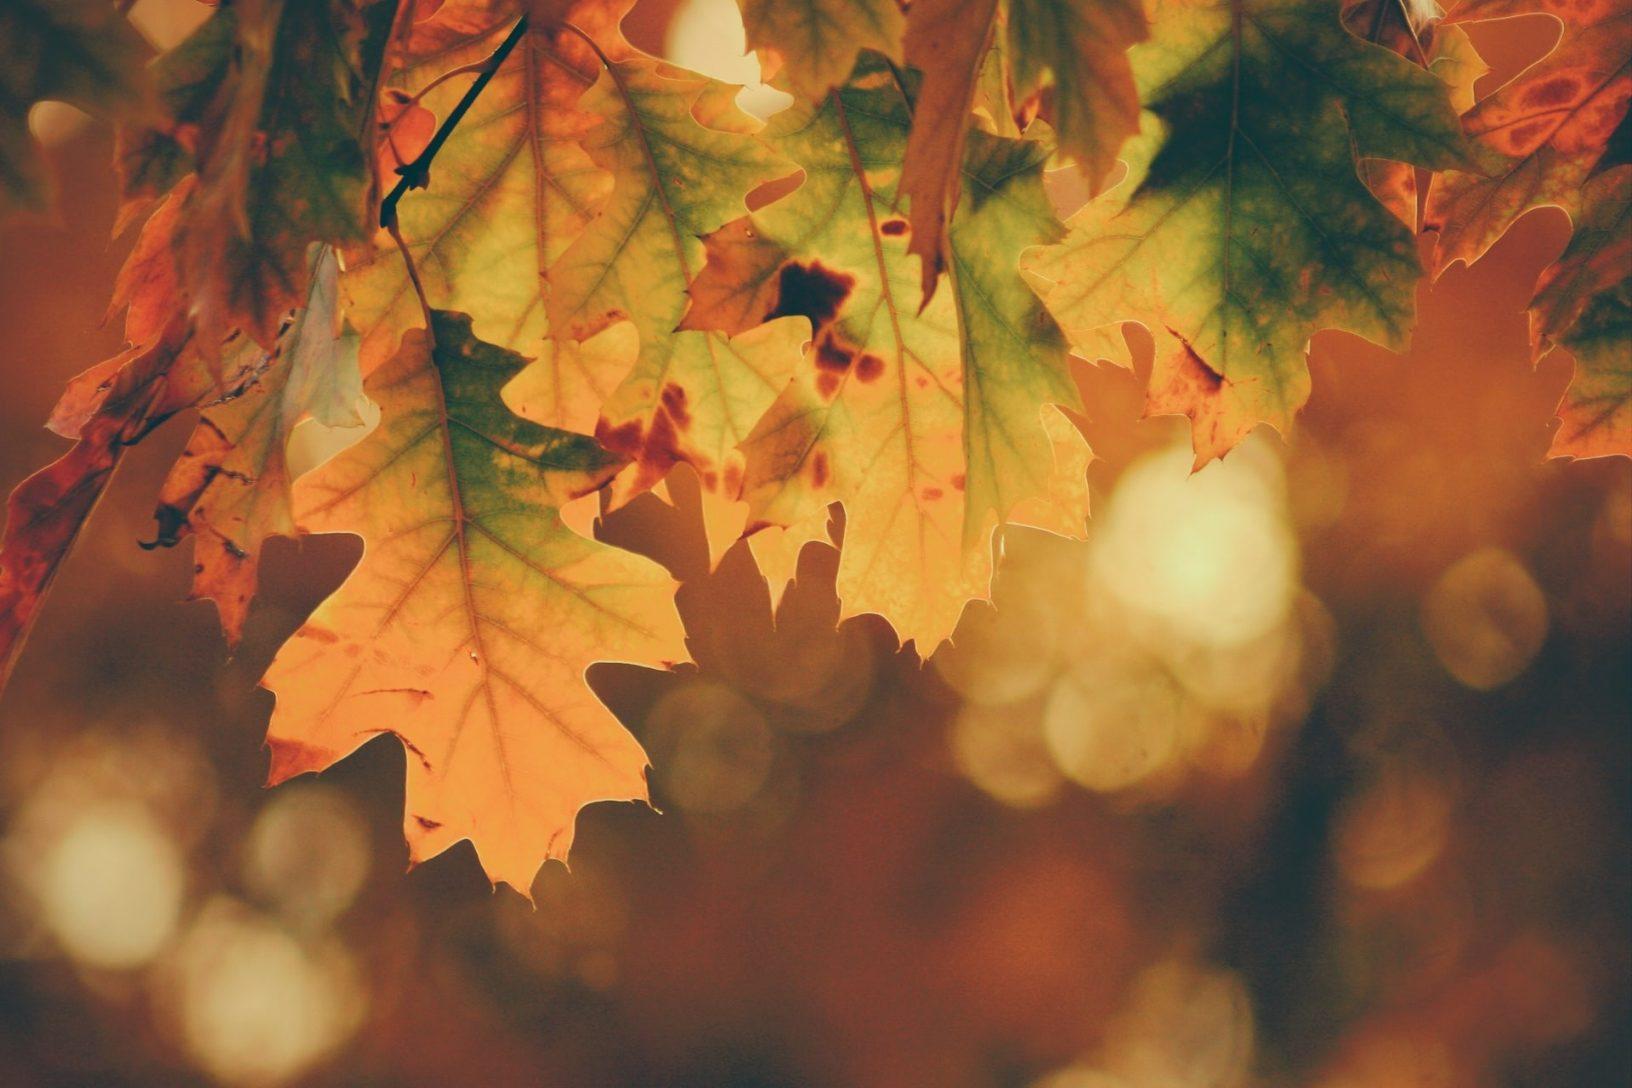 Autumn wellbeing calendar activities